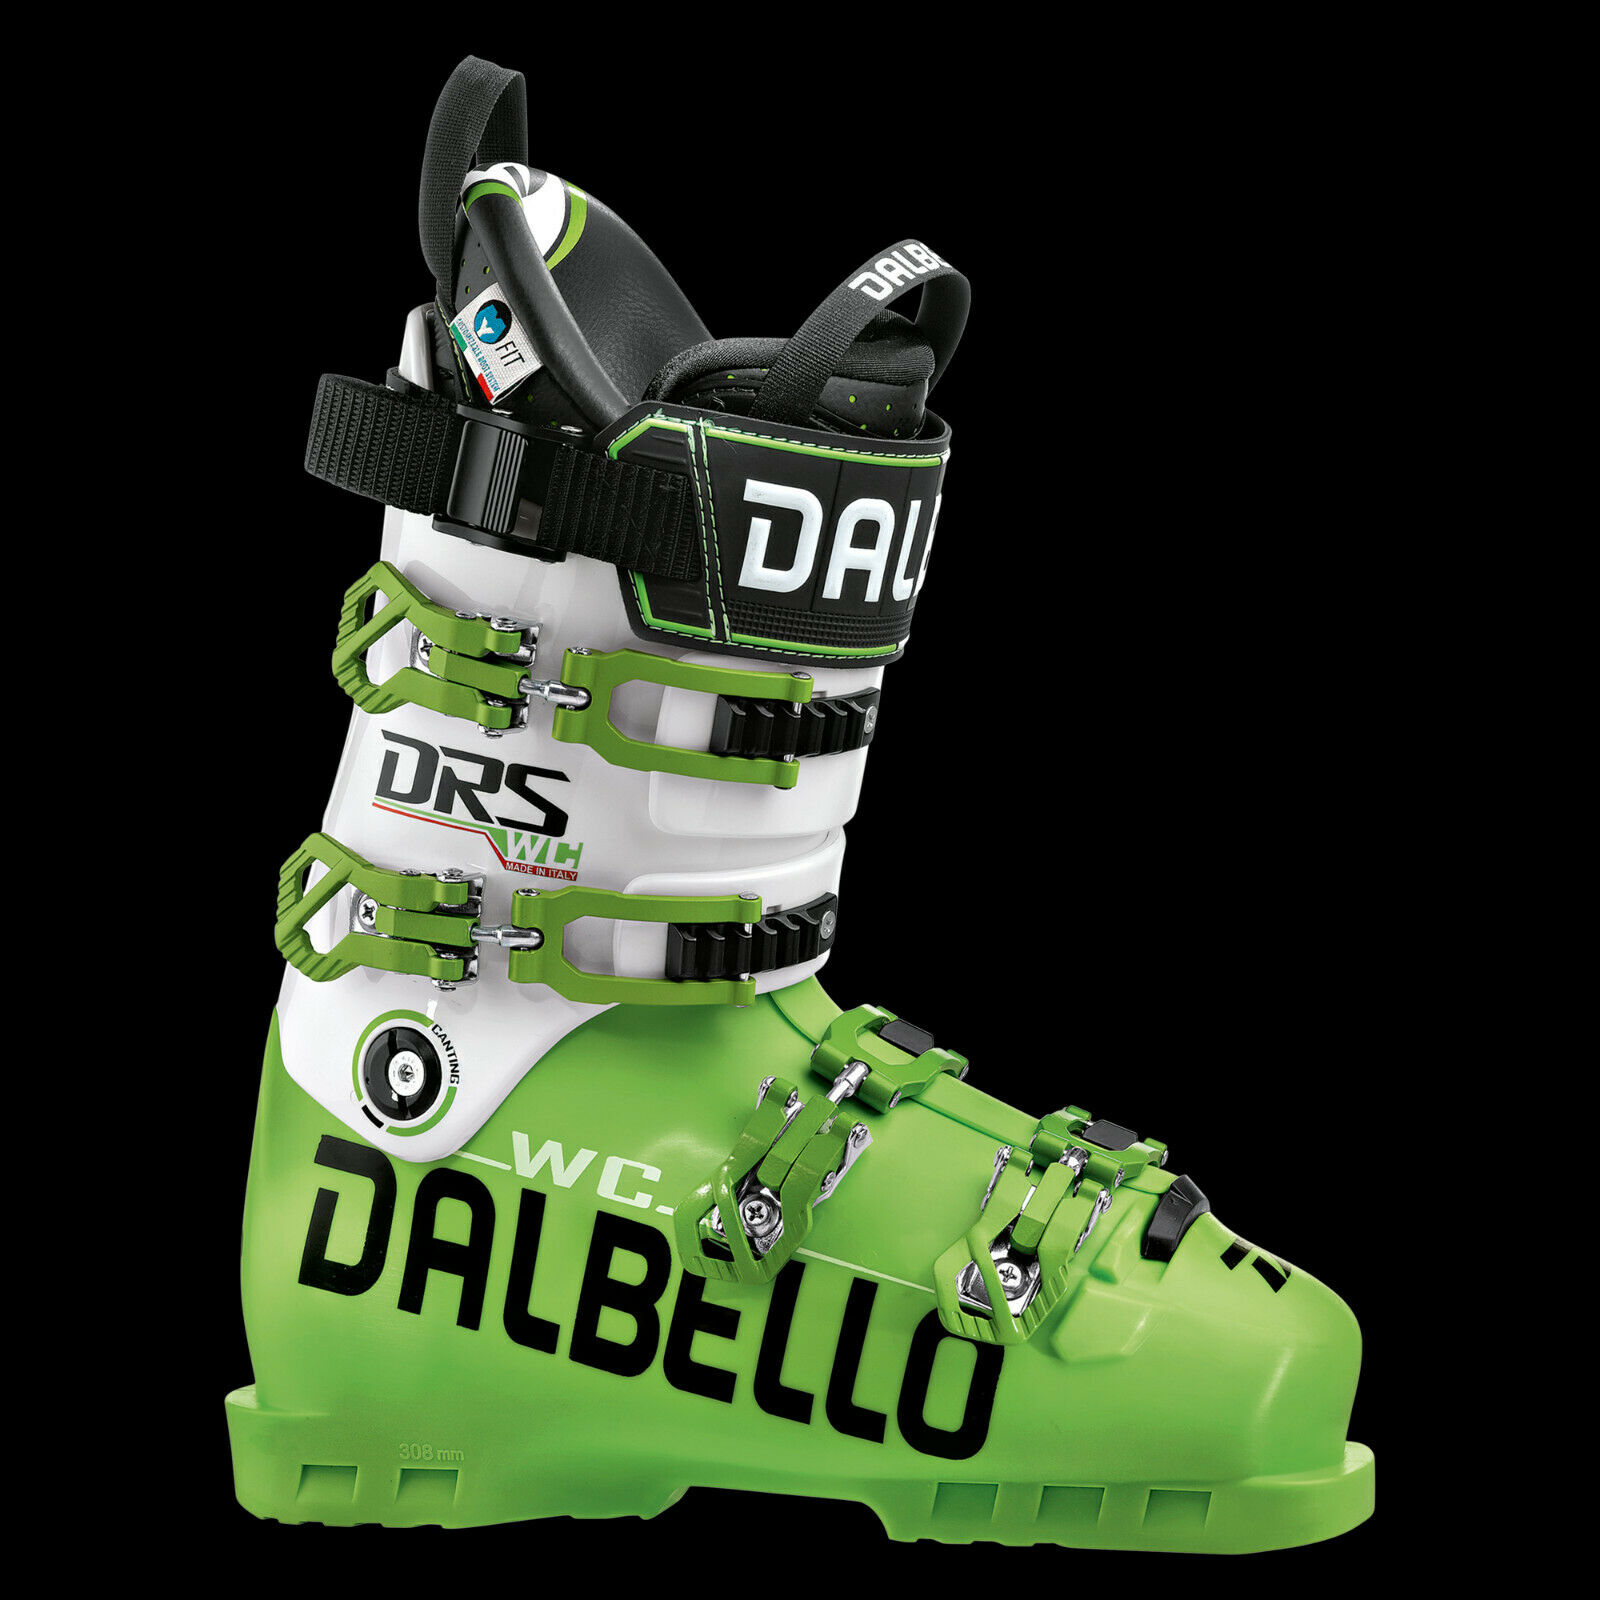 Dalbello DRS World Cup 93 S Rennskischuhe Skischuhe N 22cm Ski Boots Racing